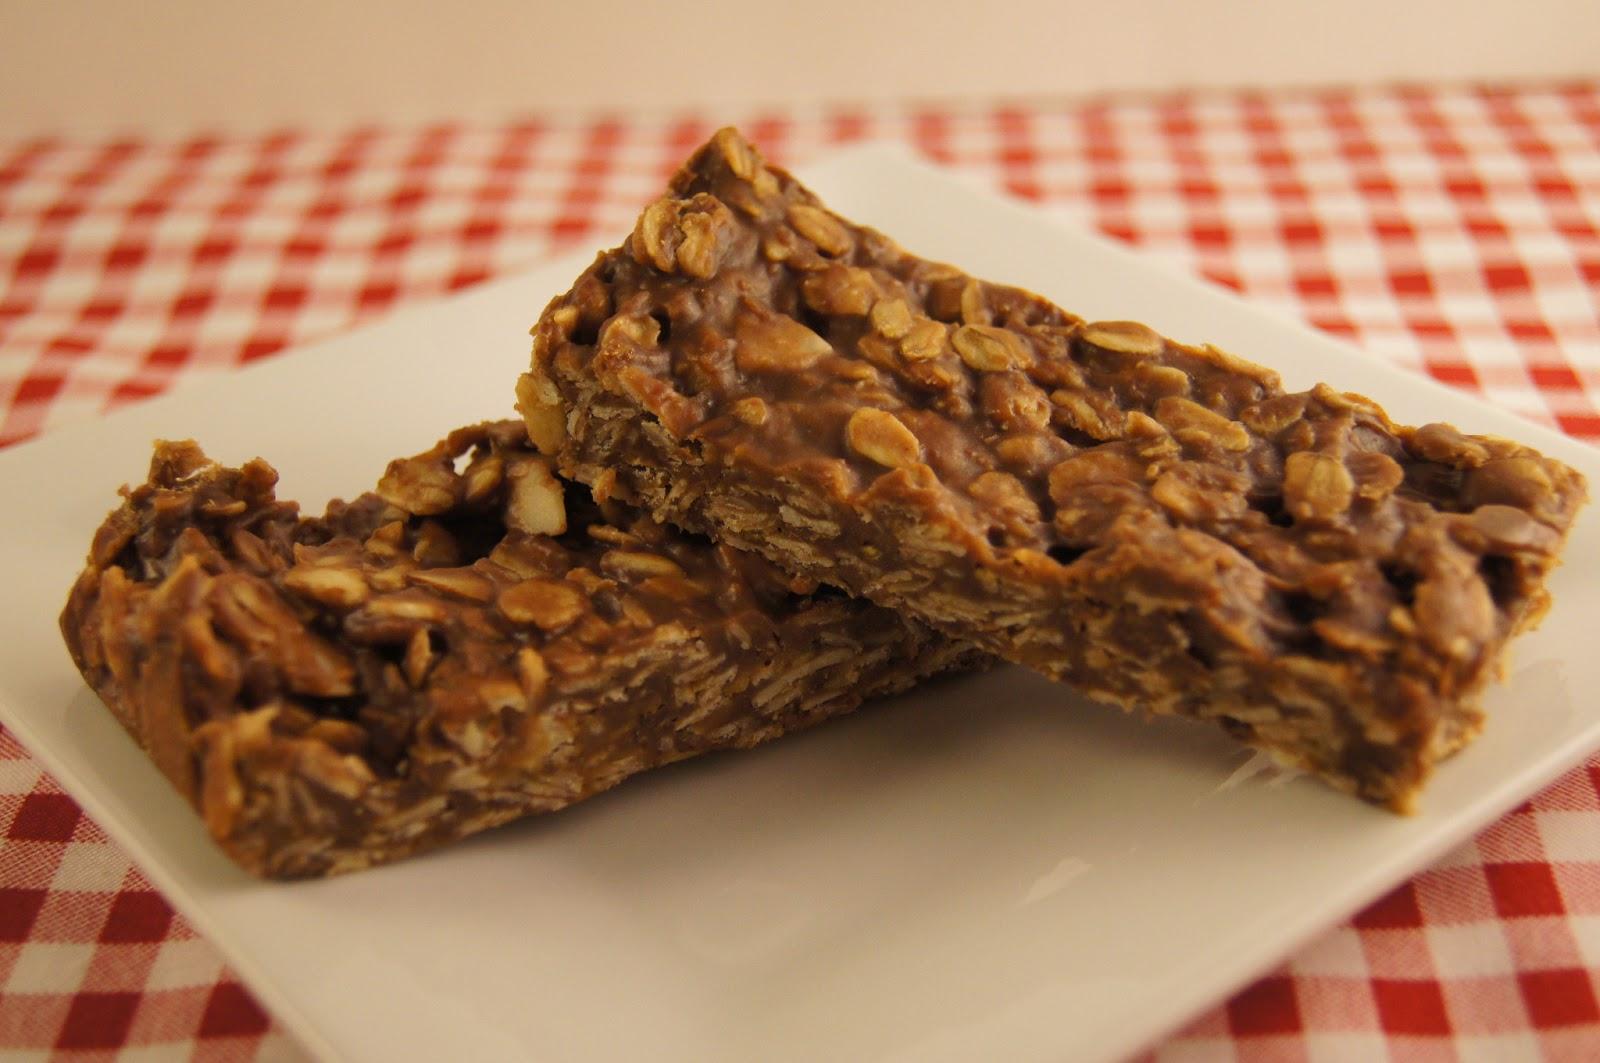 Elizabeth's Dutch Oven: Chocolate Peanut Butter Granola Bars